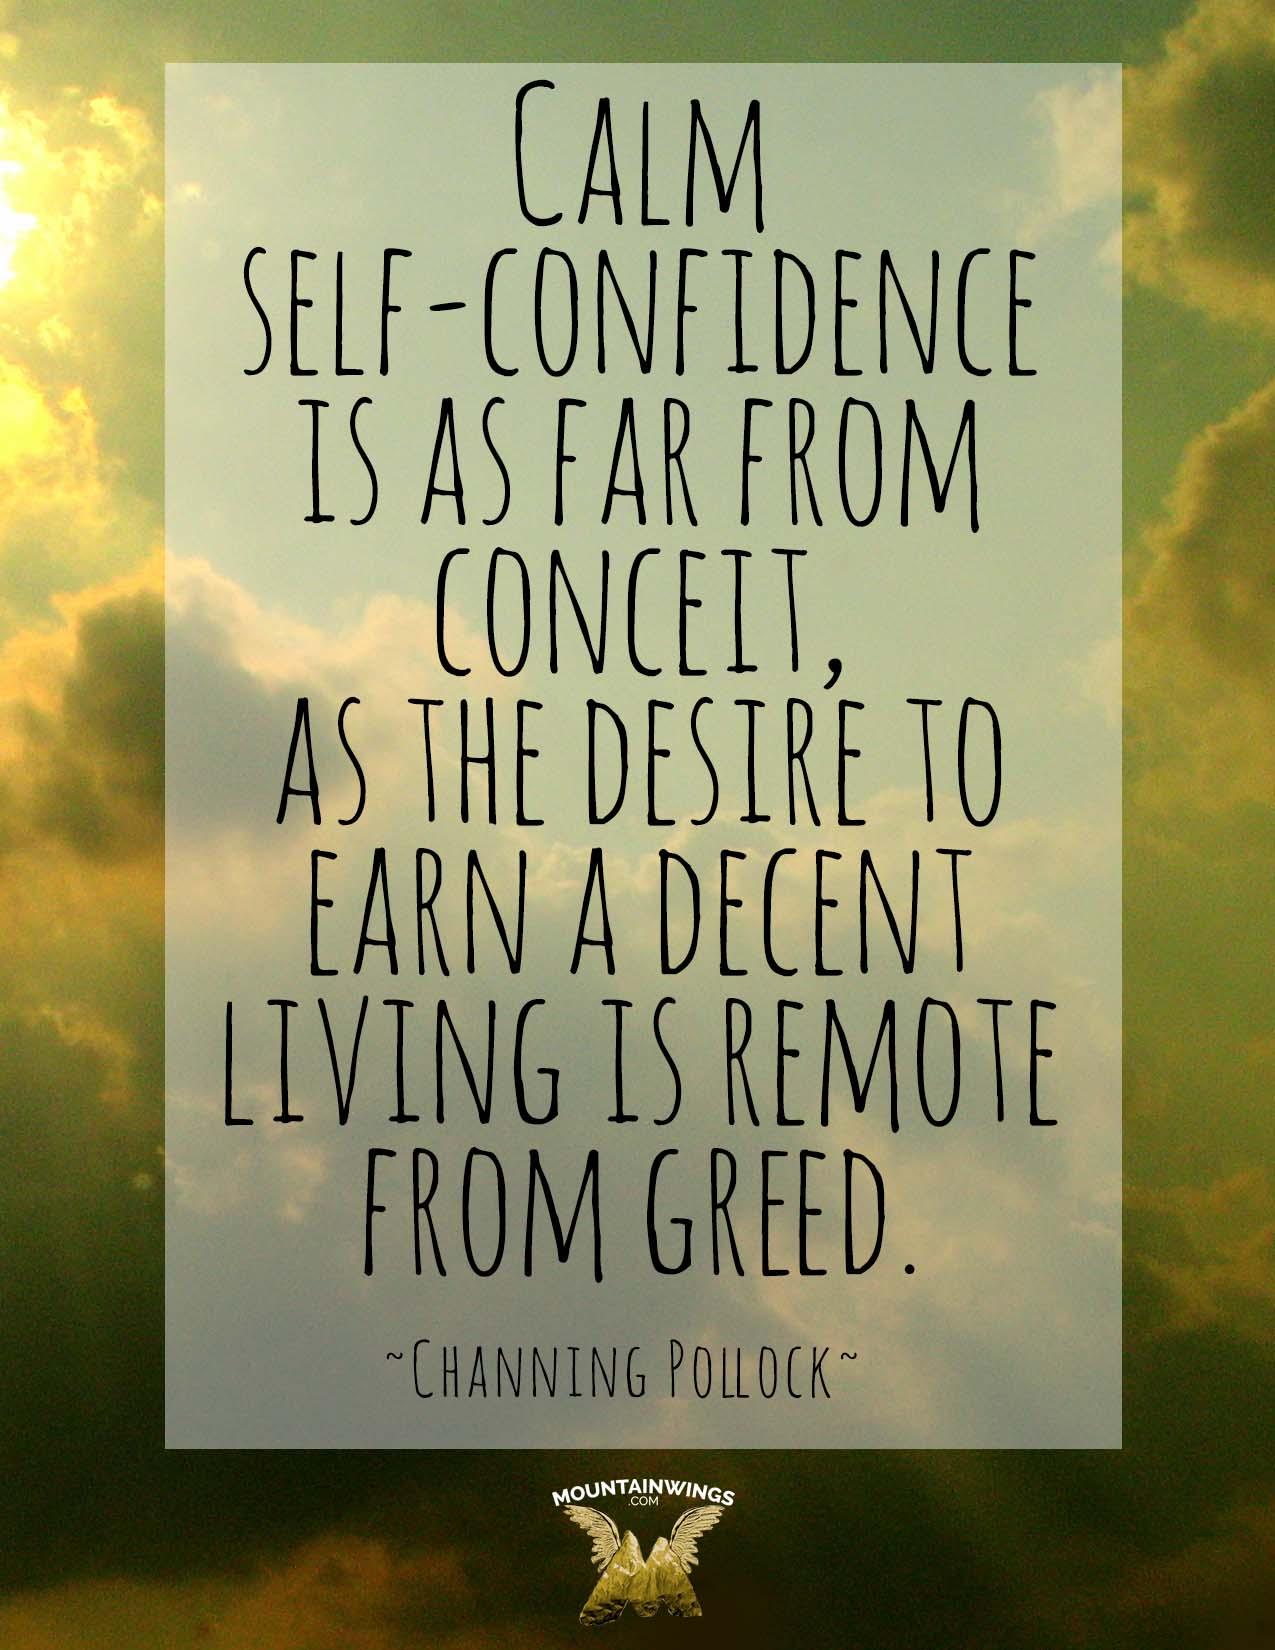 Calm self confidence